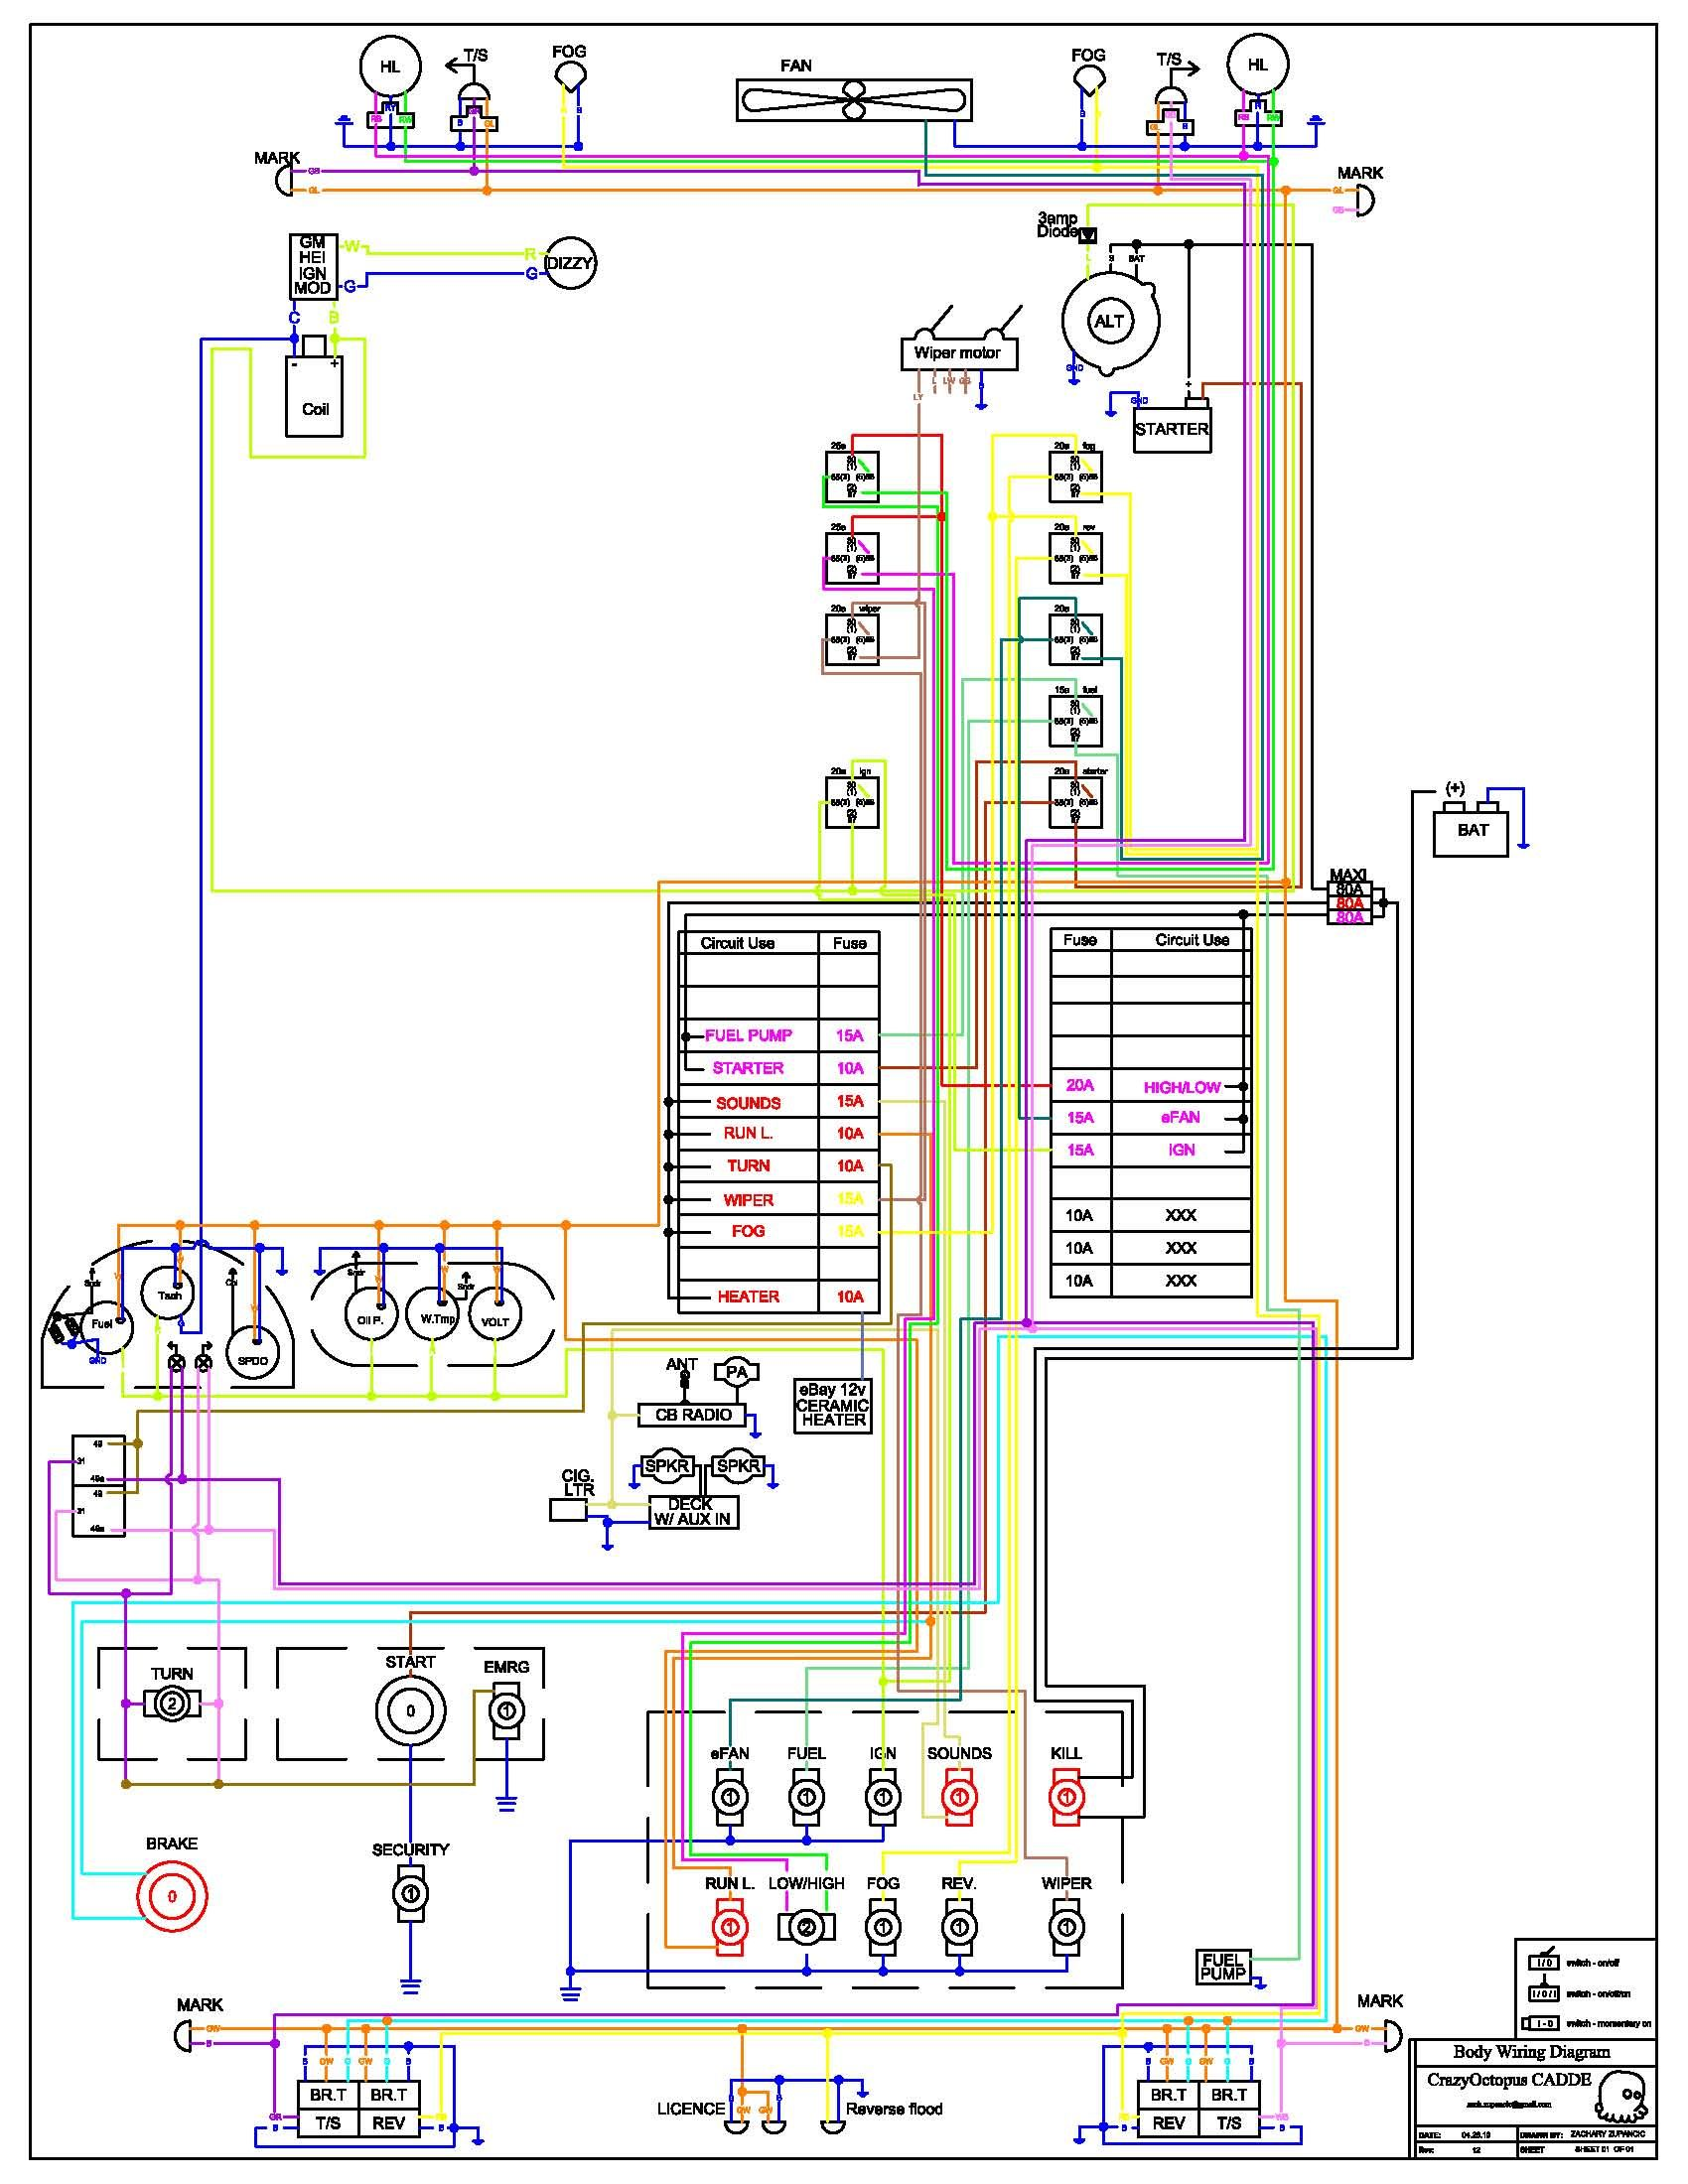 Wiring Diagram Slot Car Track | Ho Slot Car Wiring Diagram |  | Wiring Diagram